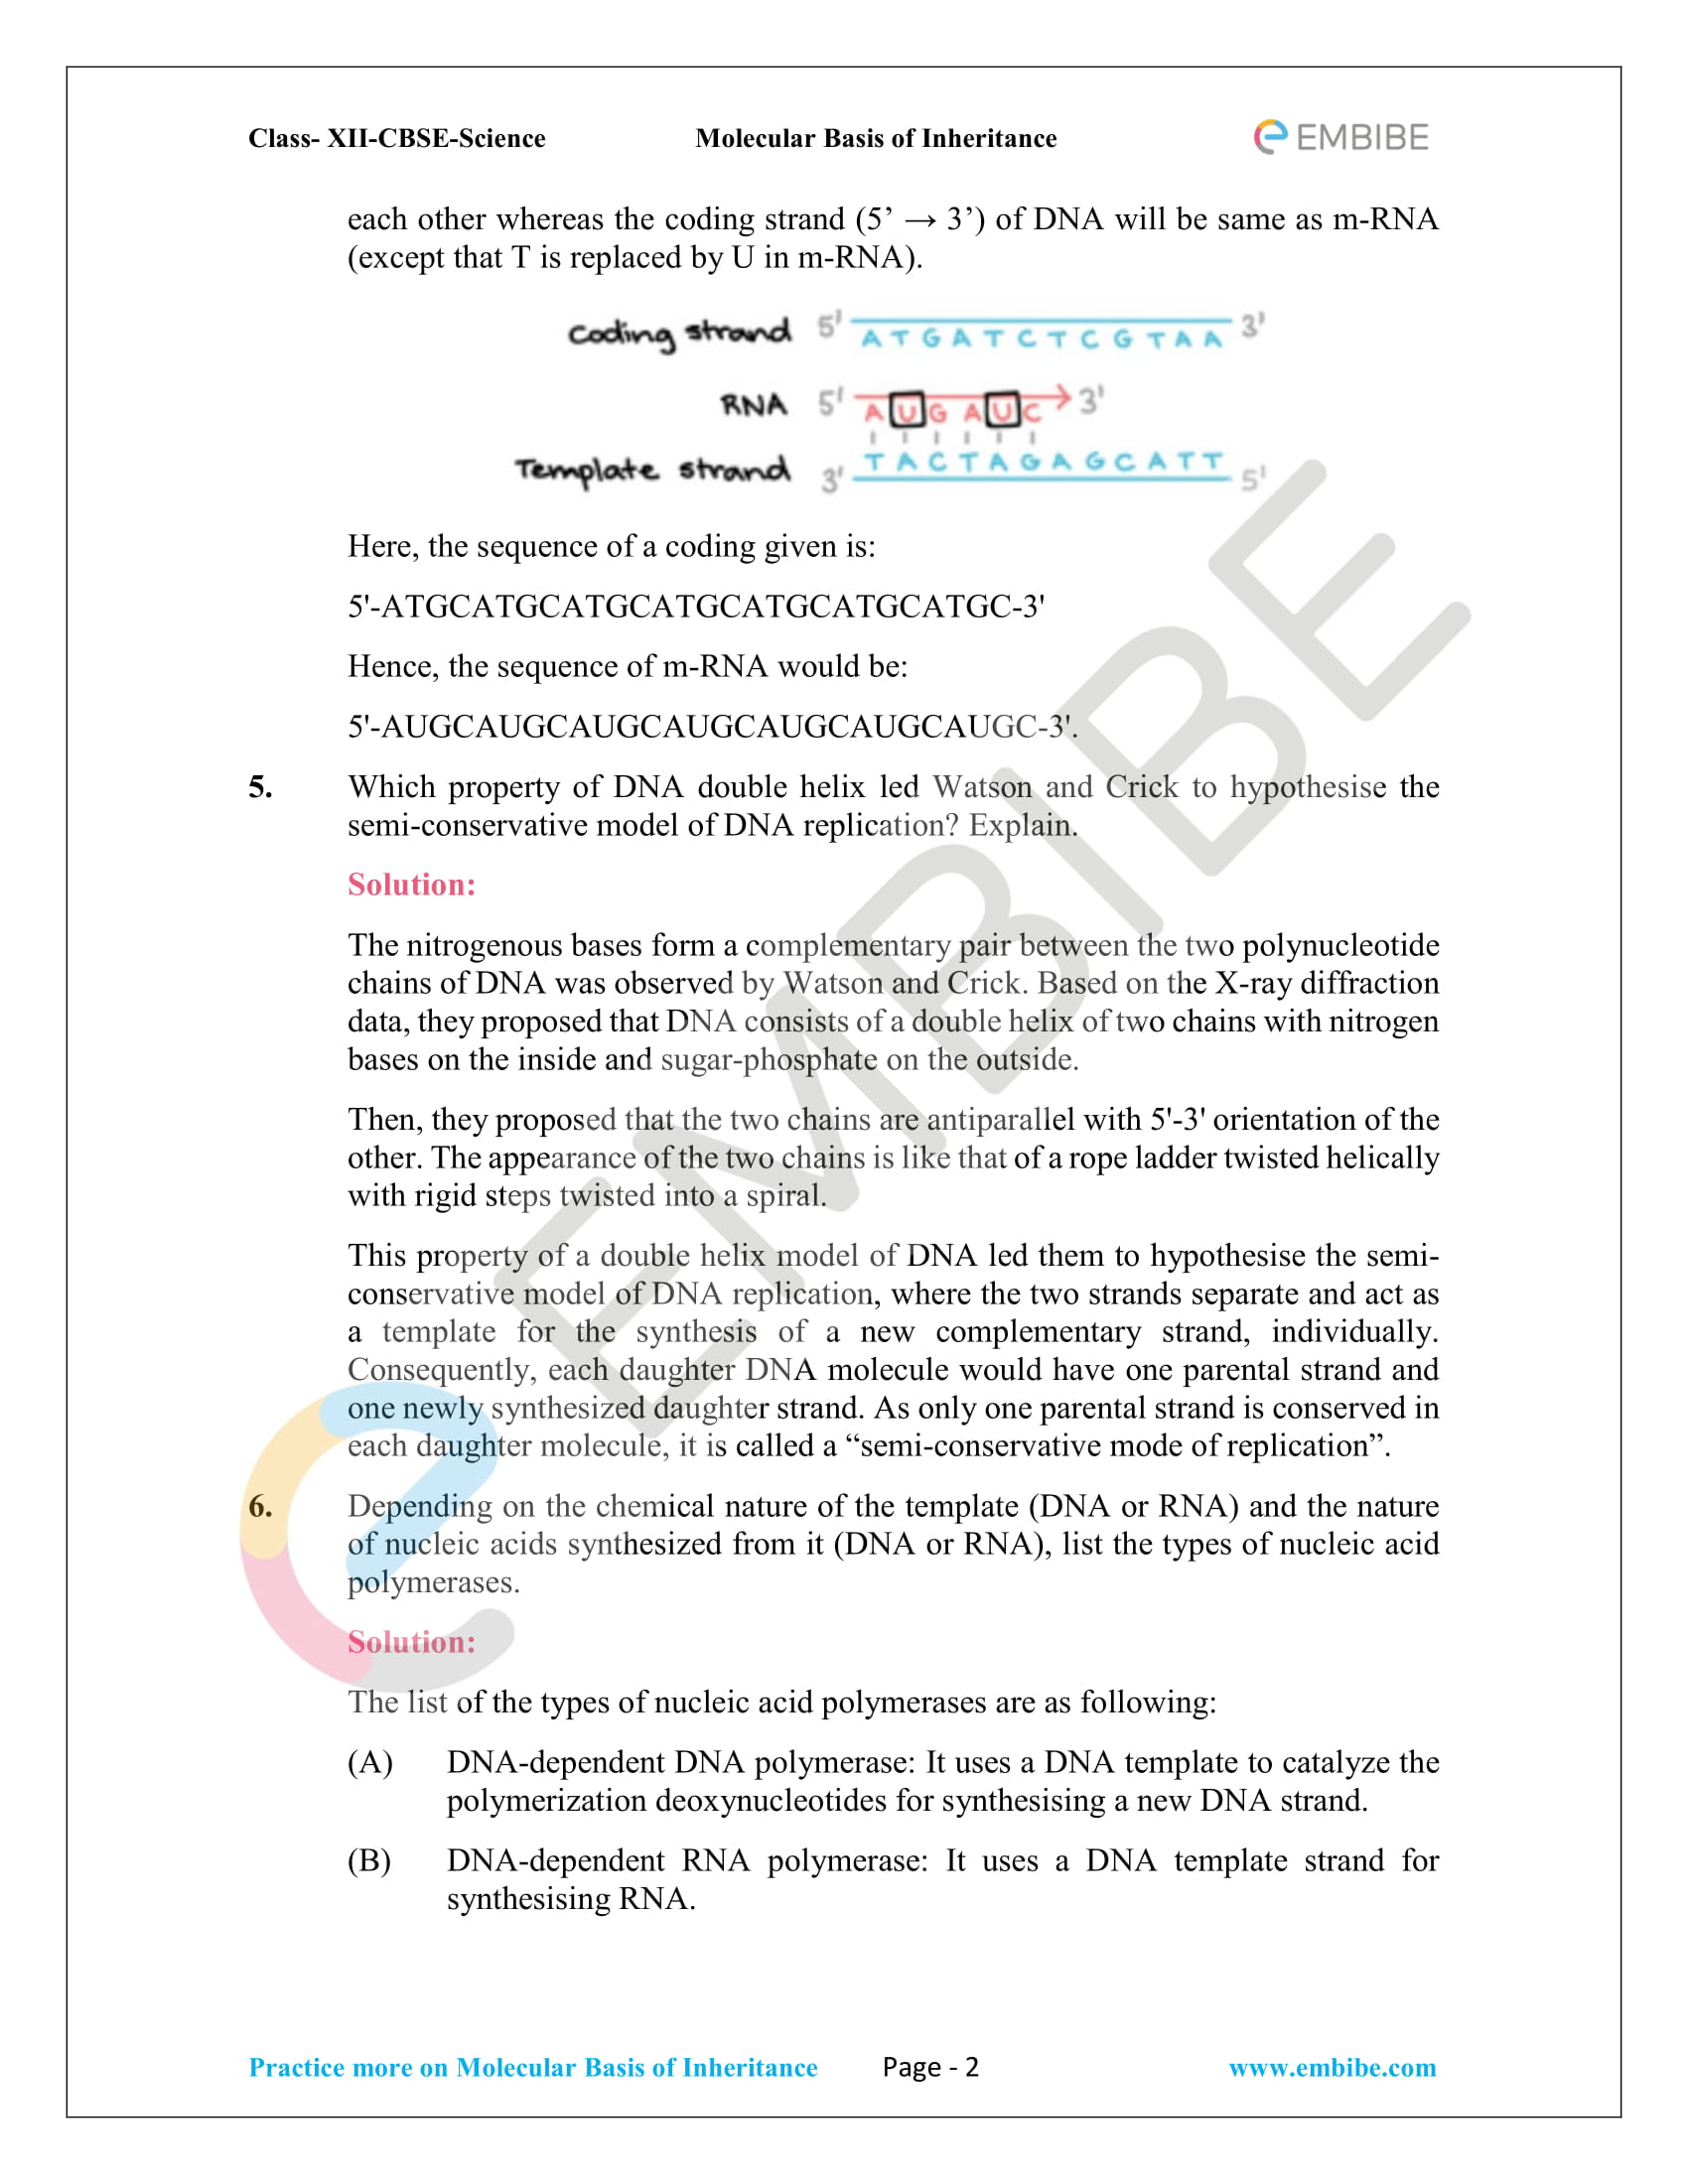 NCERT Solutions for Class 12 Biology Chapter 6: Molecular Basis Of Inheritance - 2